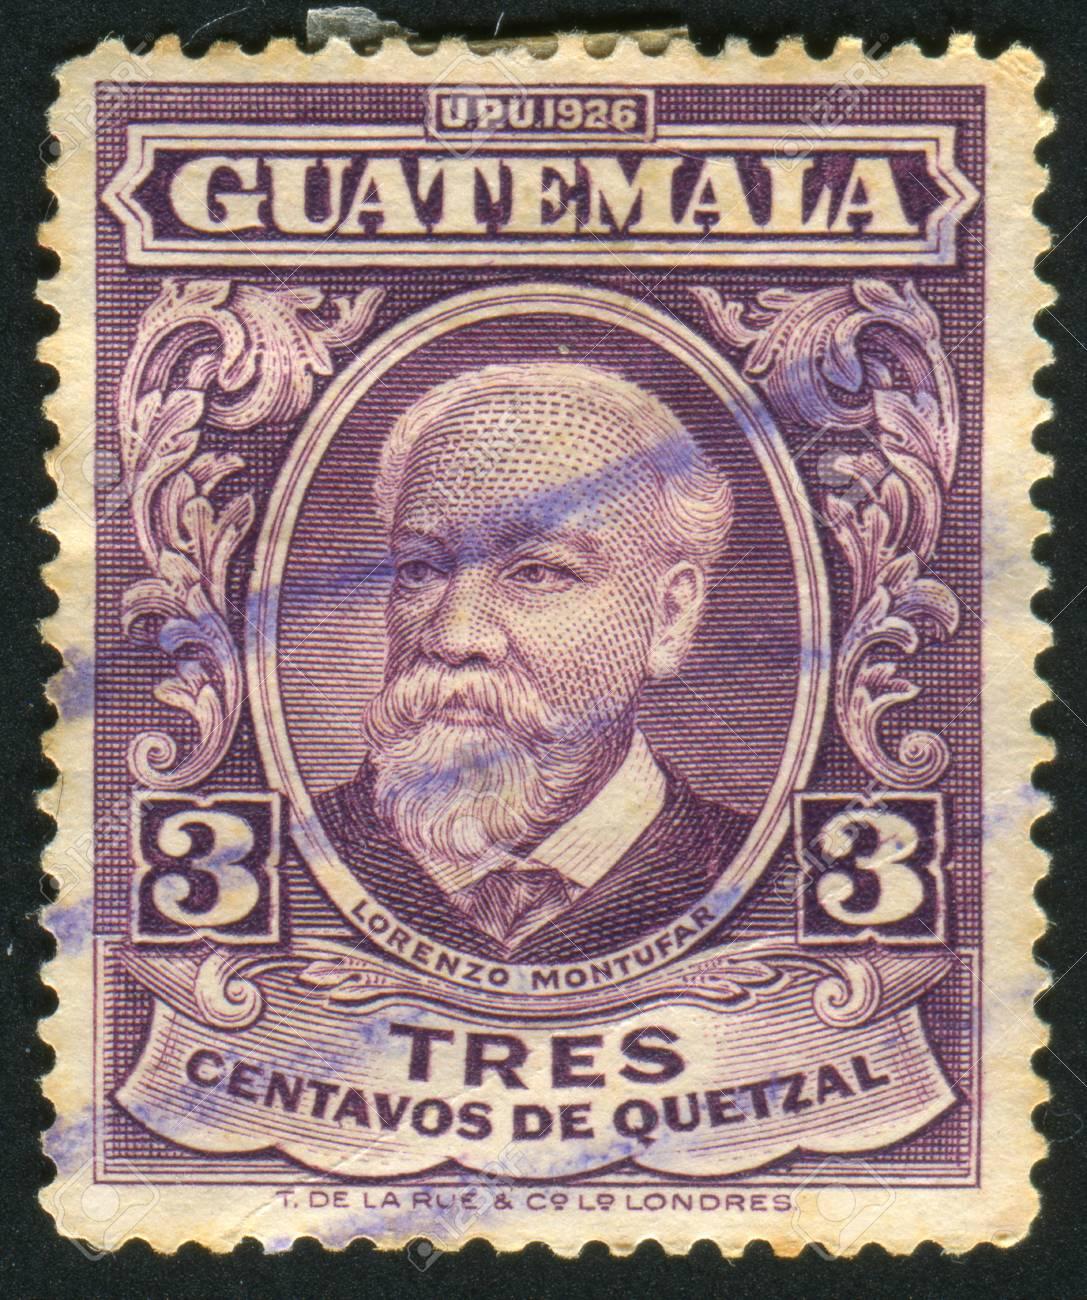 GUATEMALA - CIRCA 1926: stamp printed by Guatemala, shows Lorenzo Montufar, circa 1926 Standard-Bild - 8824238